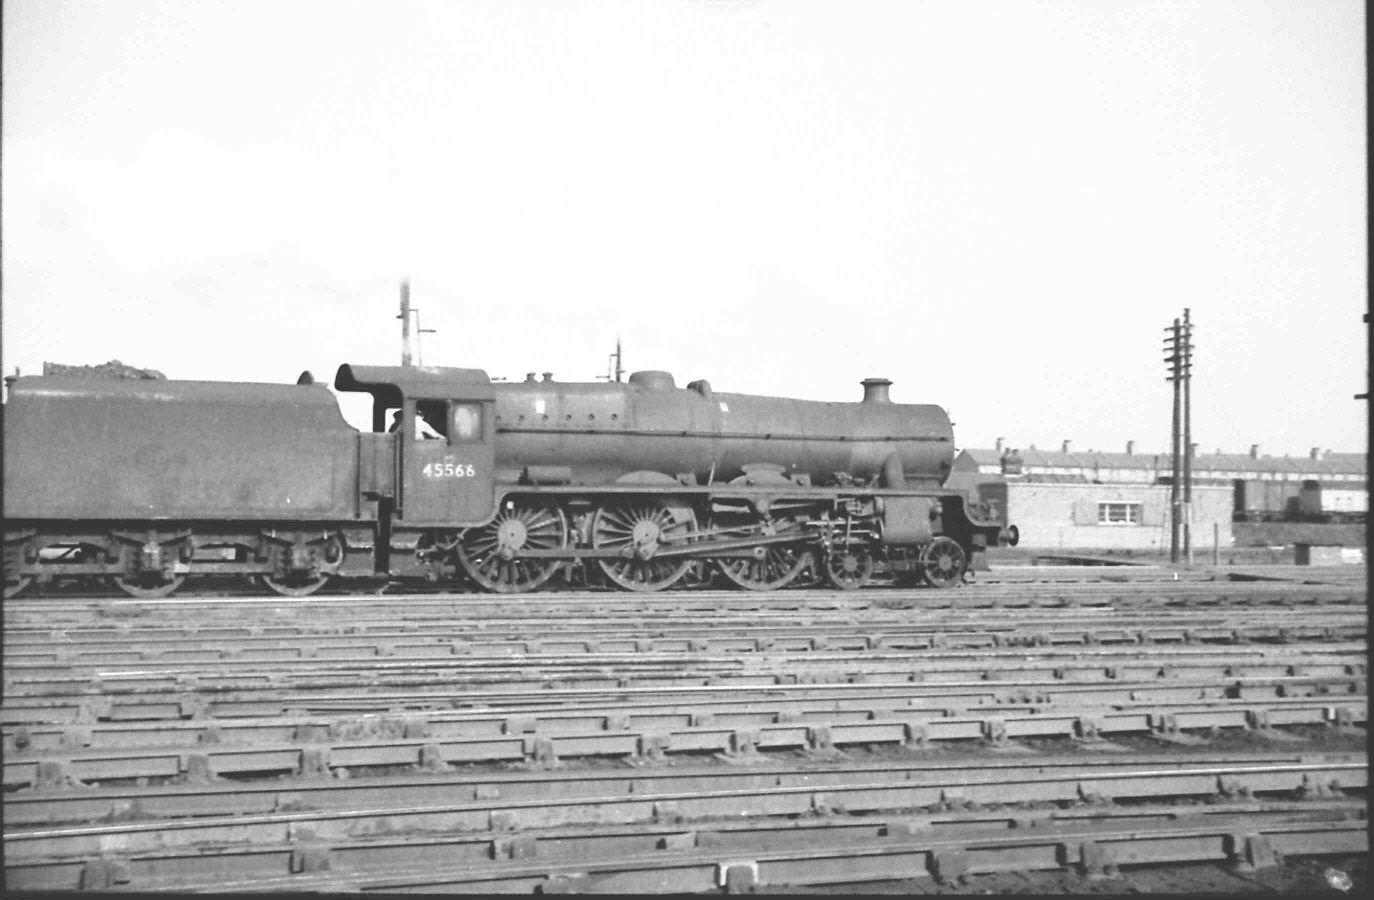 45566 Queensland at Brent (Cricklewood) in 1962